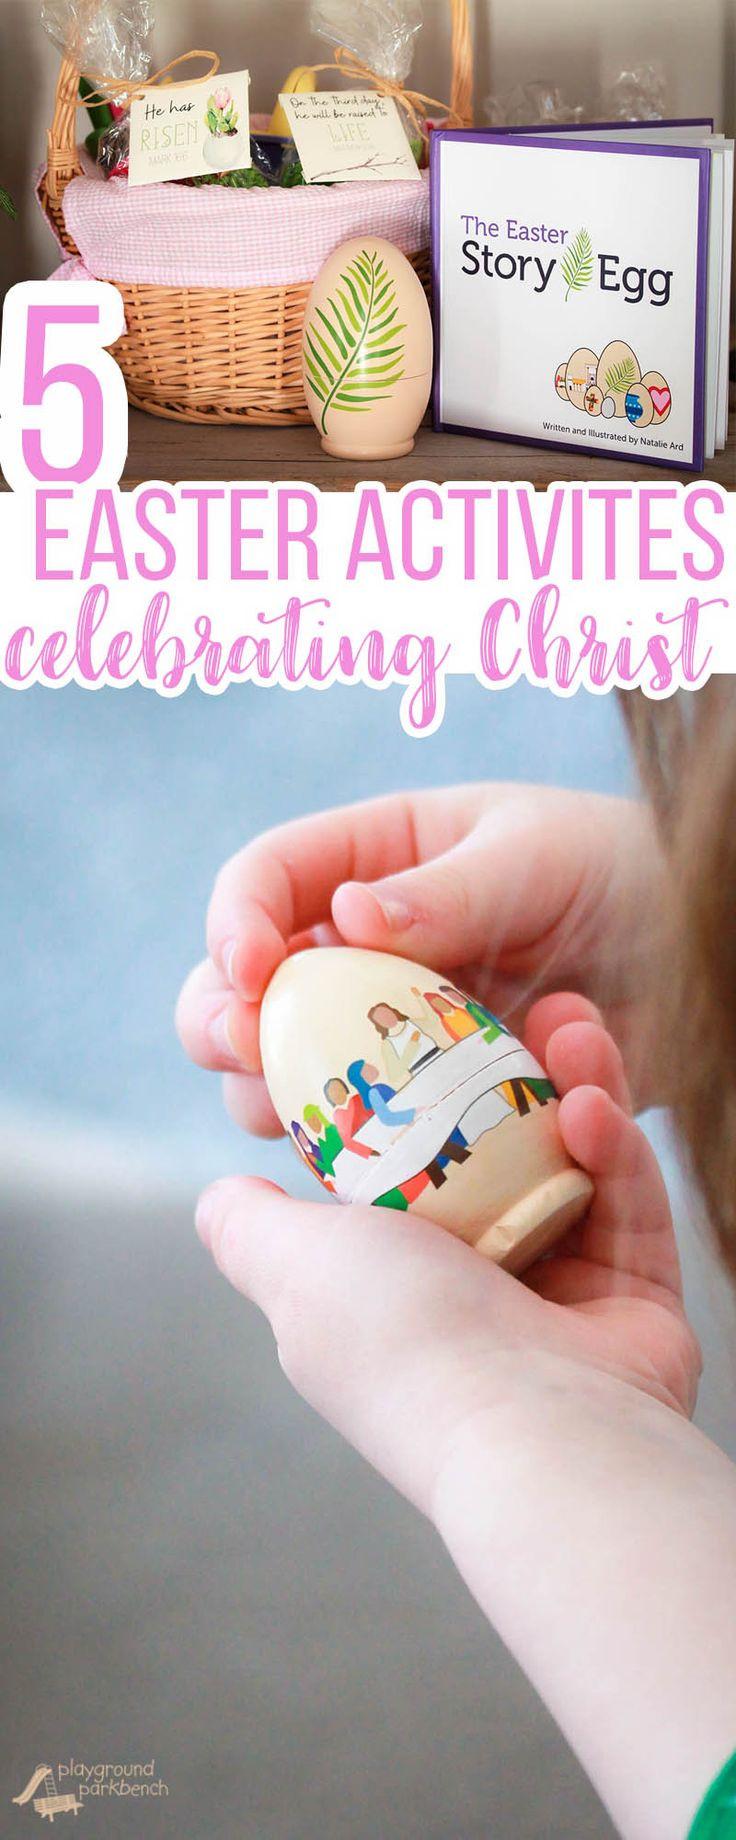 Christian School Easter Party Ideas  Best 25 Christian easter ideas on Pinterest